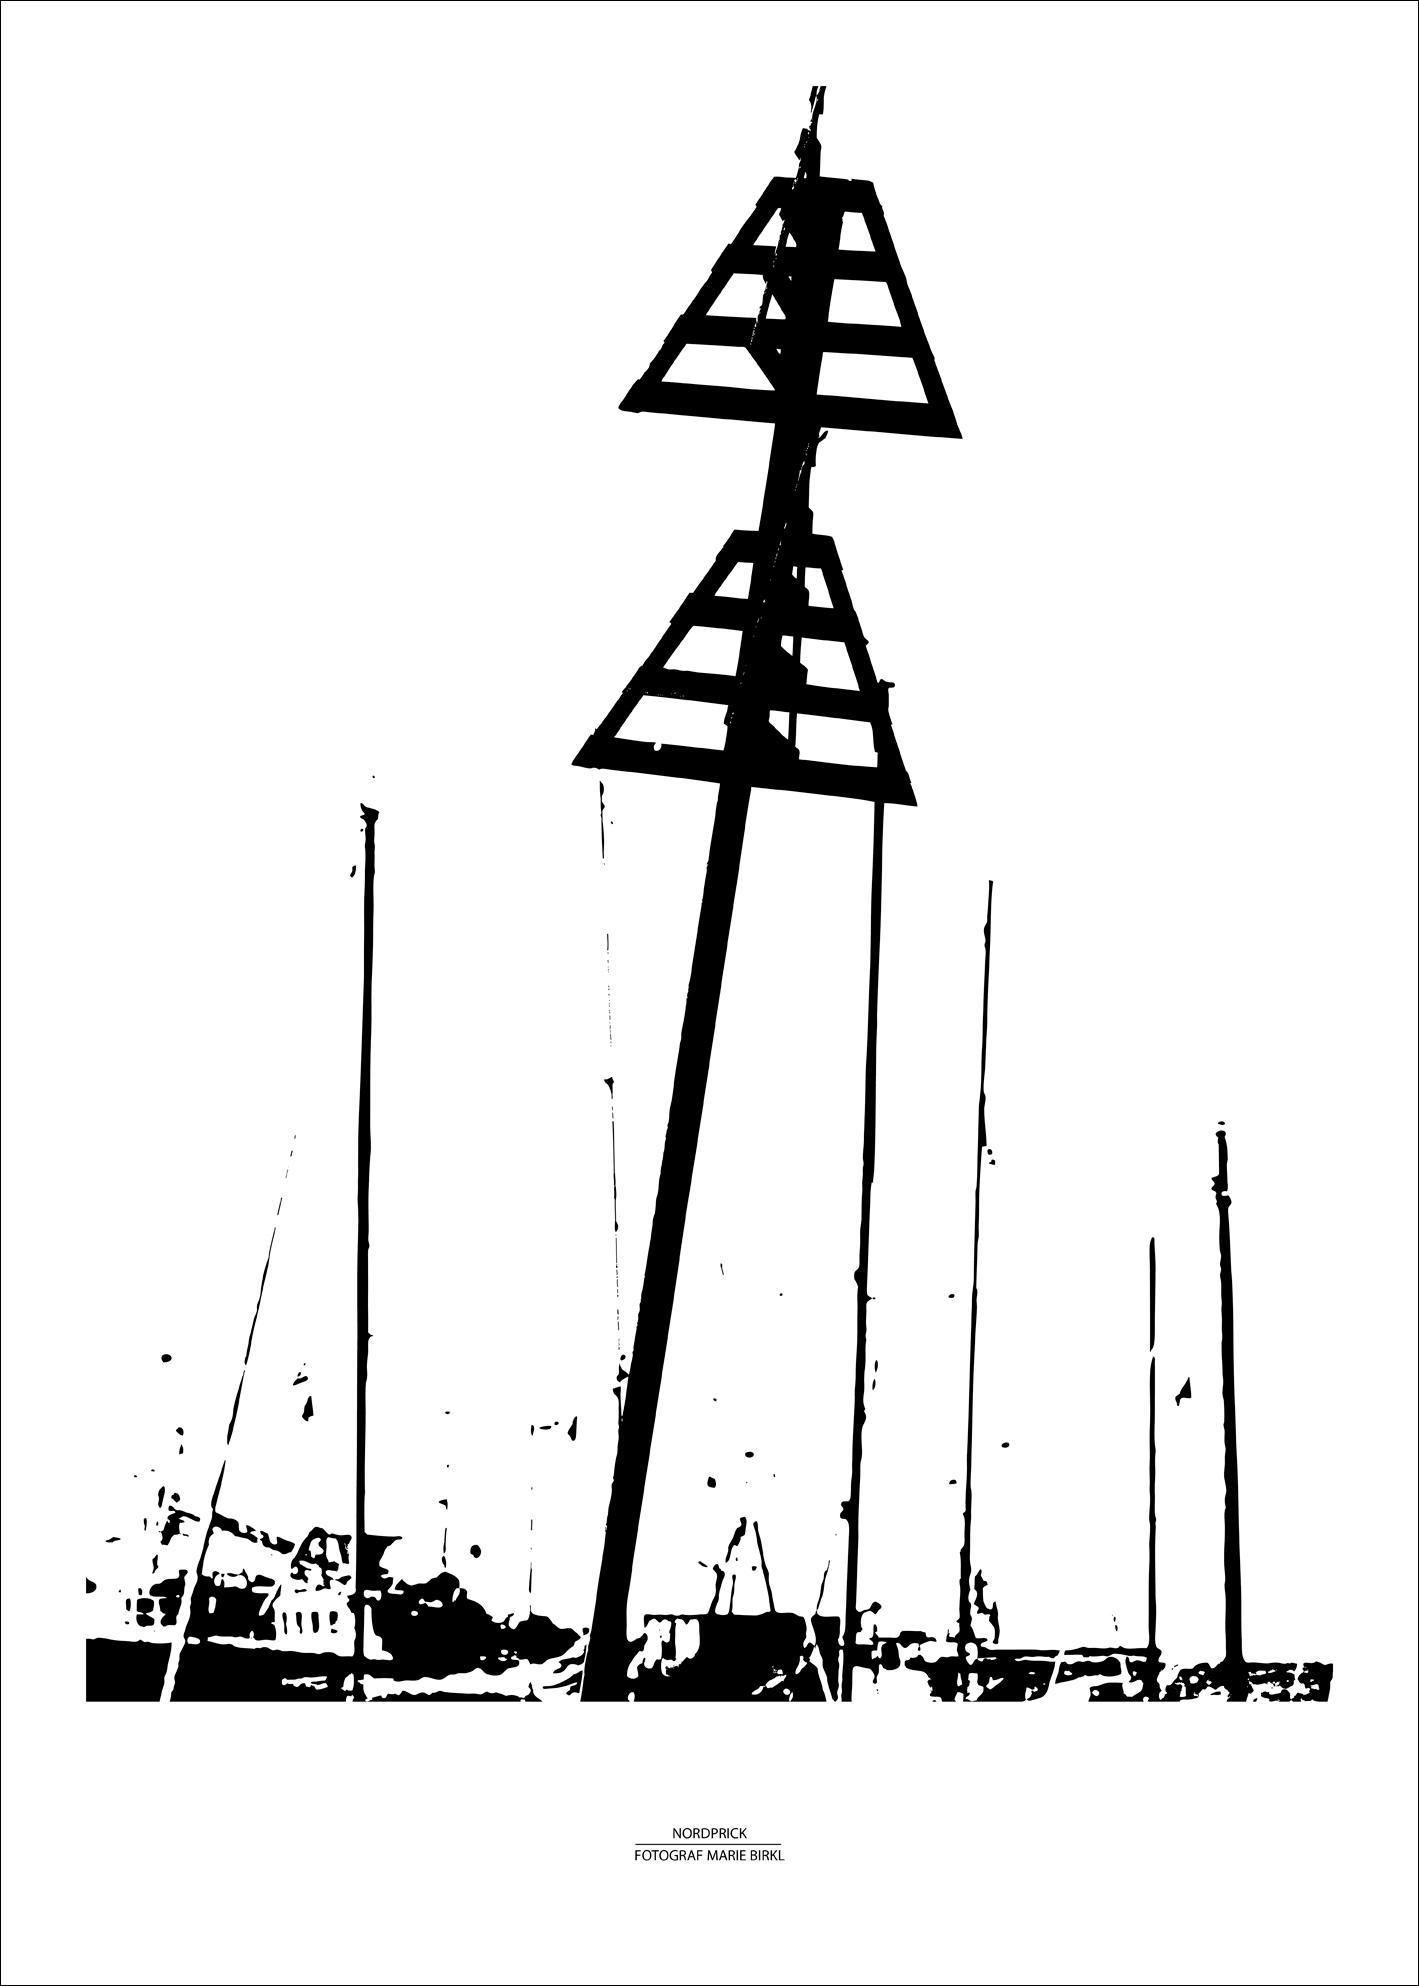 Nordprick